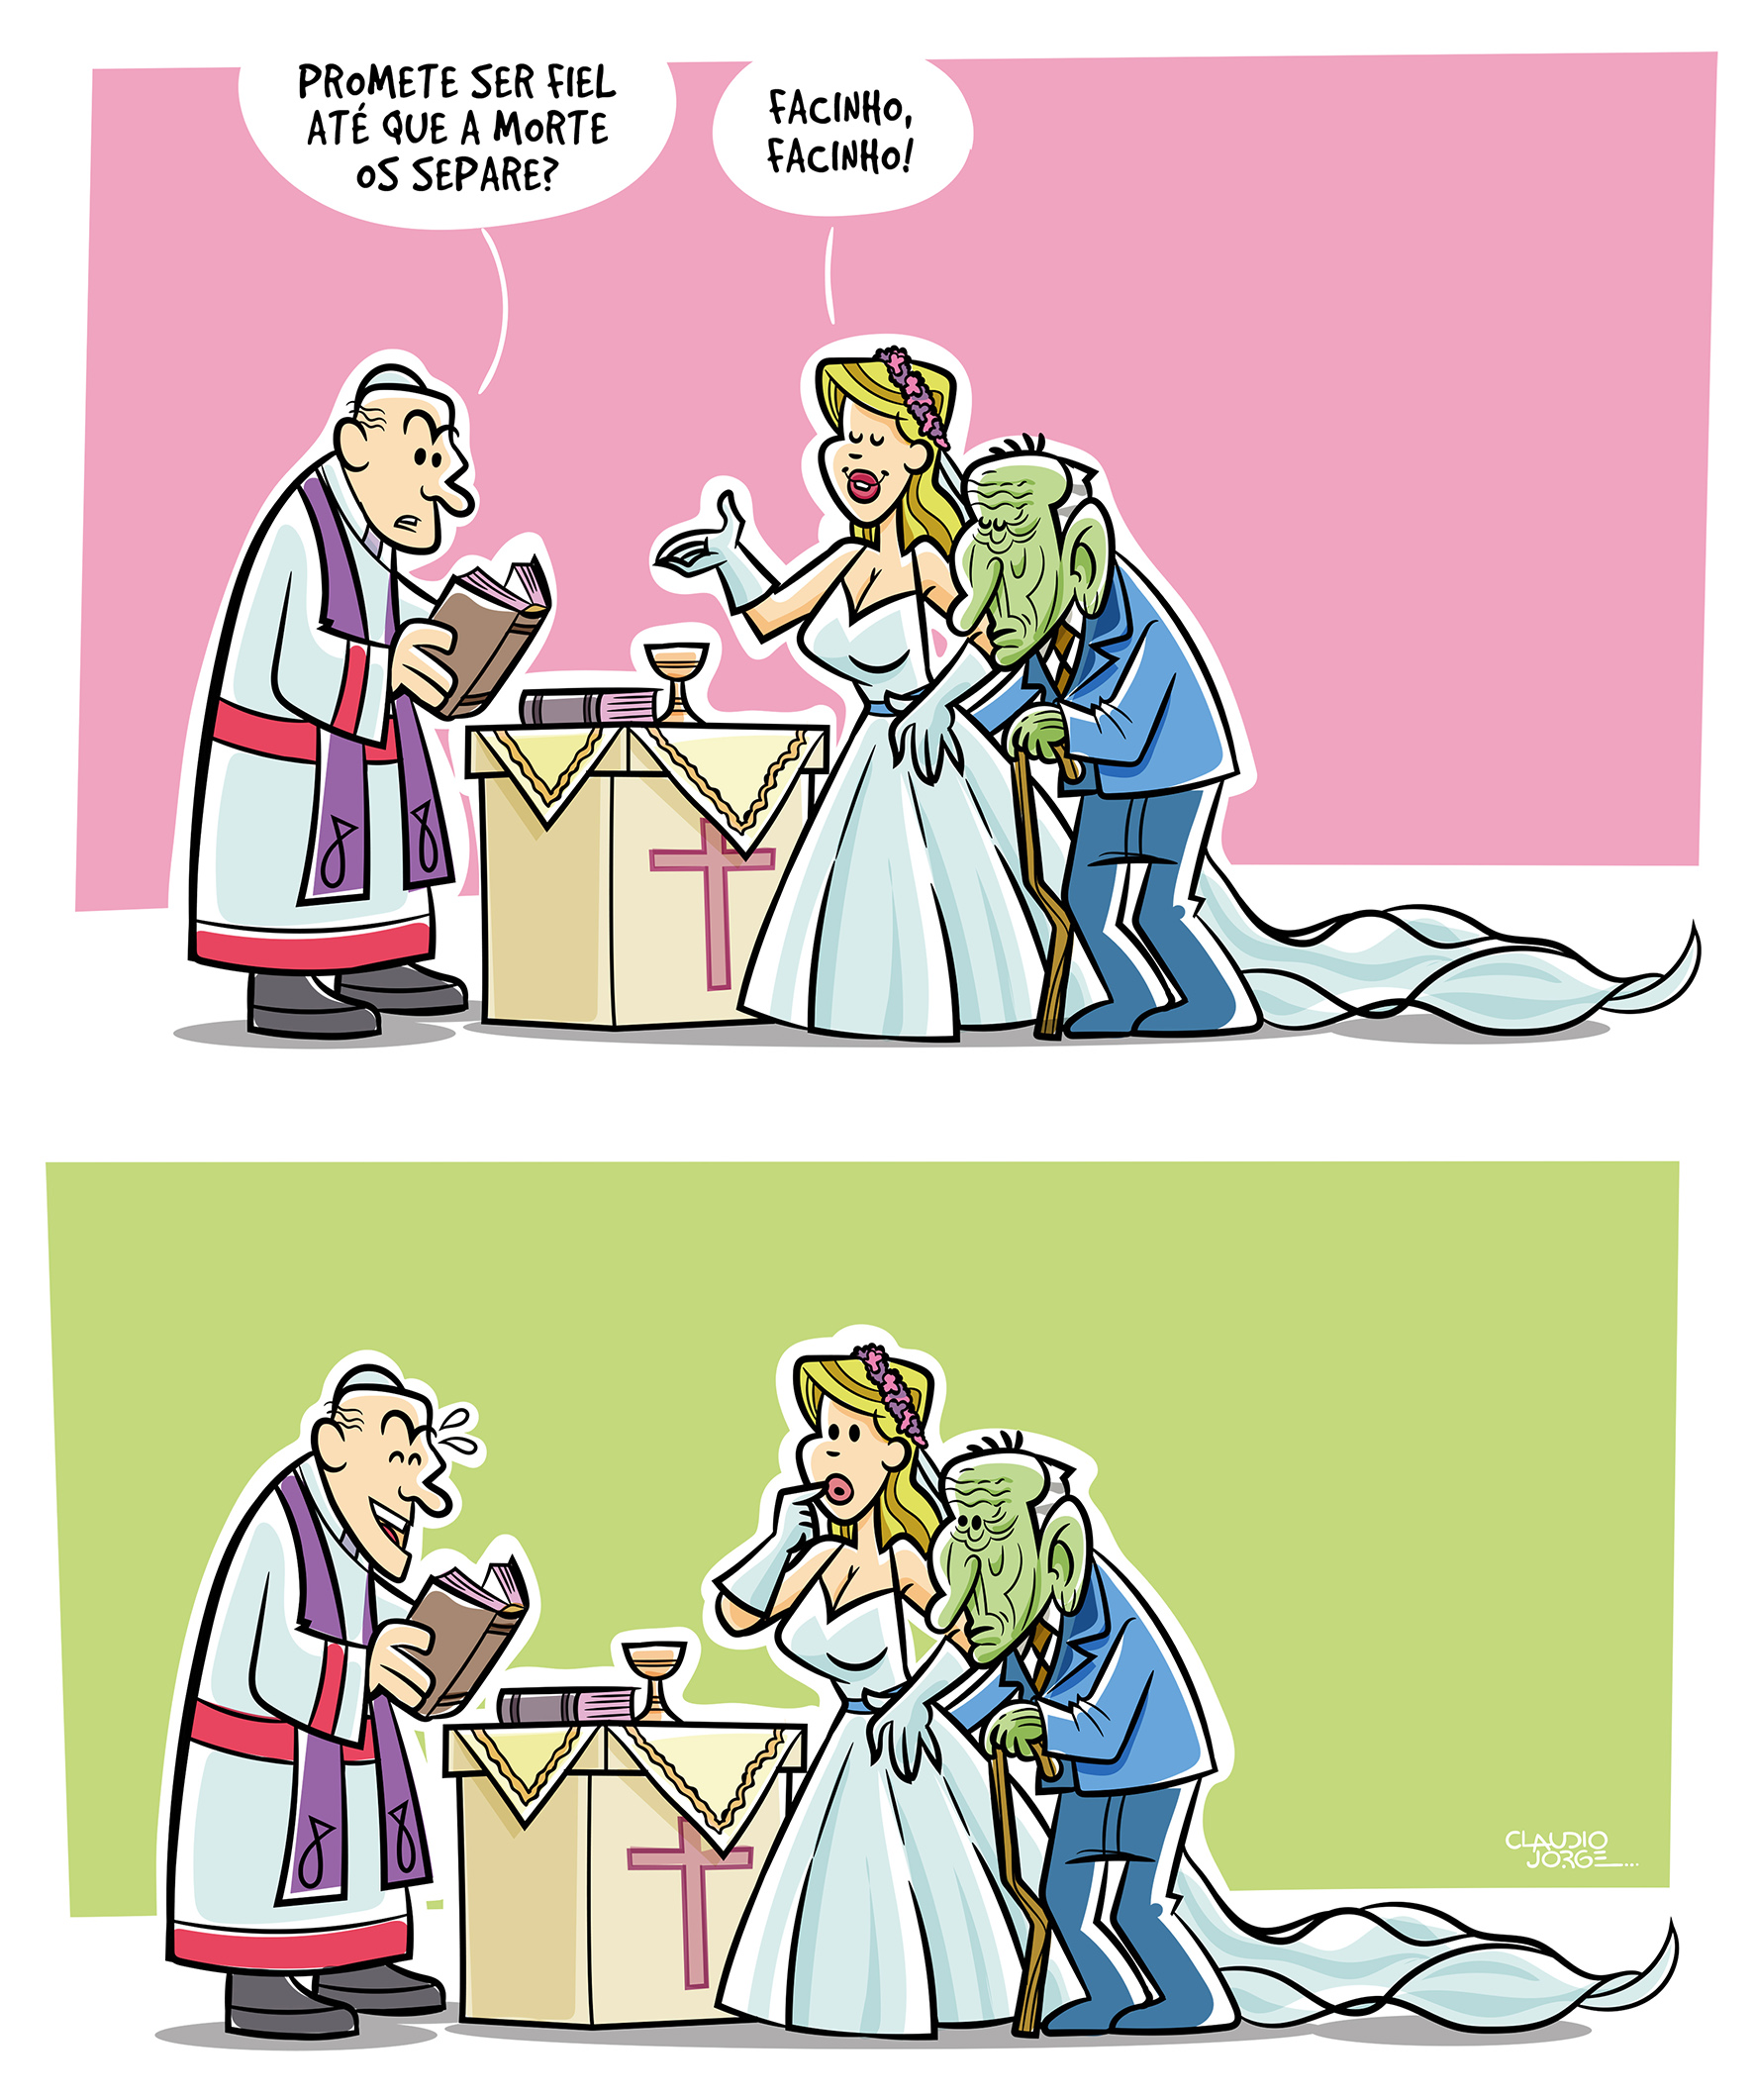 Casamento da Fidelidade